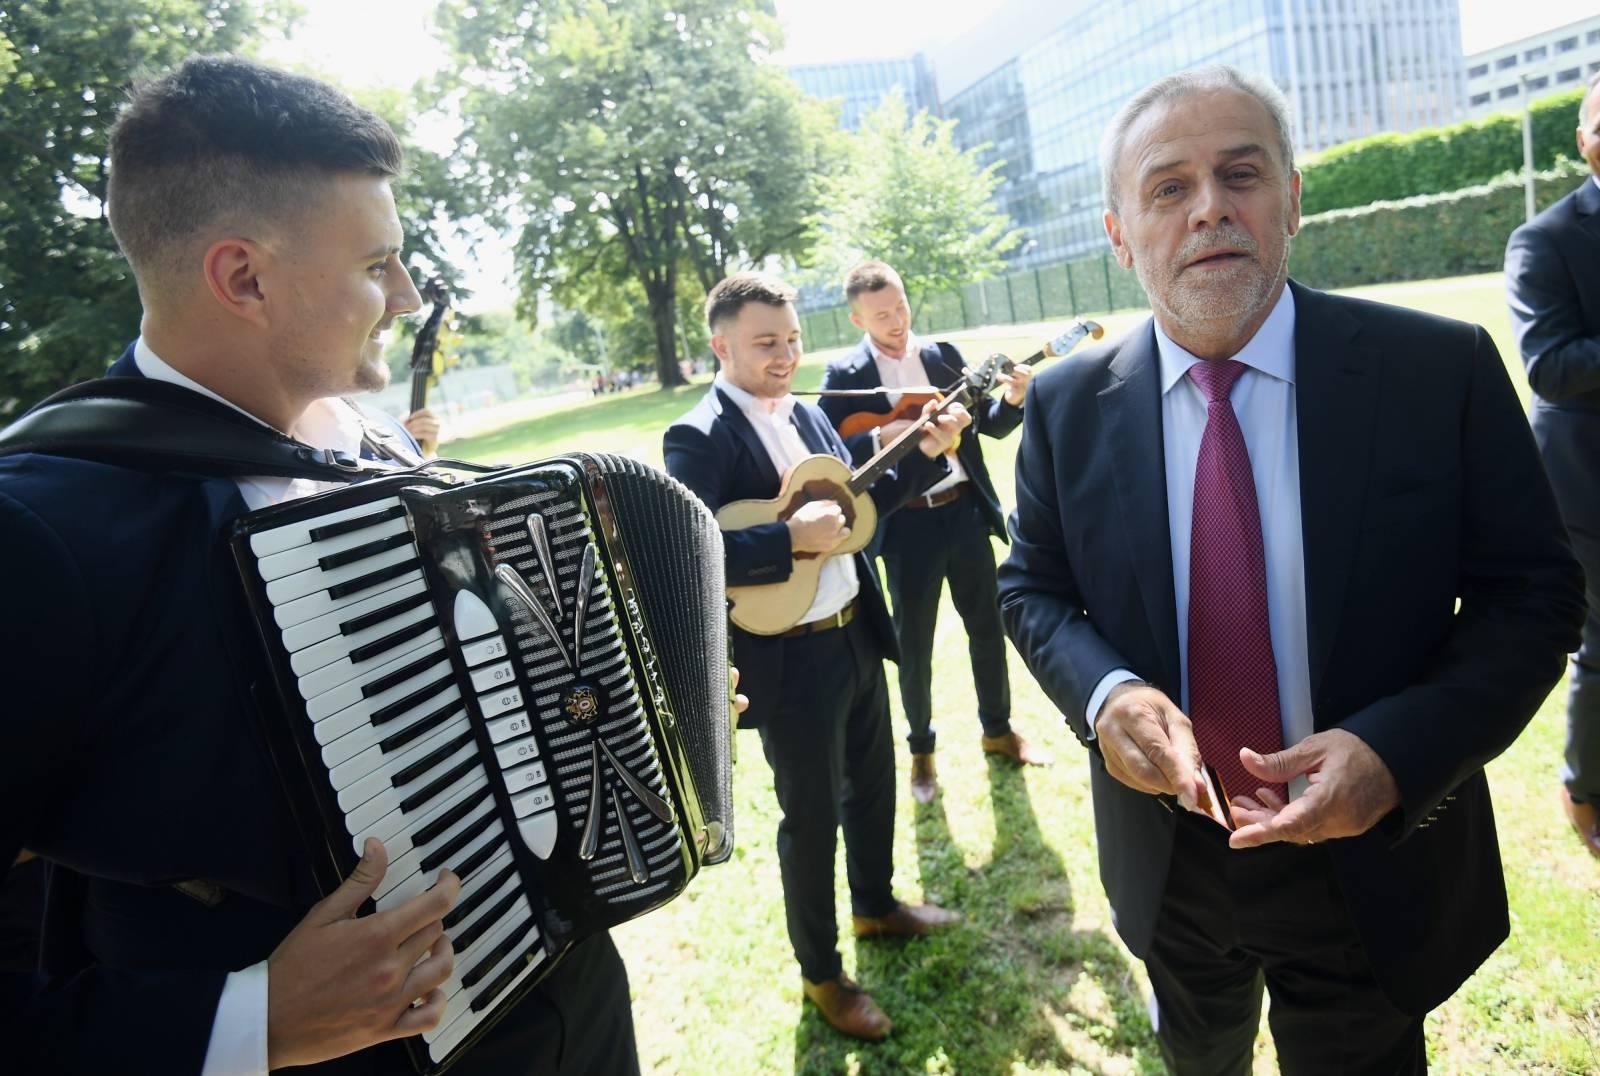 Zagreb: Milan Bandić harmonikašima dao 200 kuna i kroz harmoniku provukao karticu